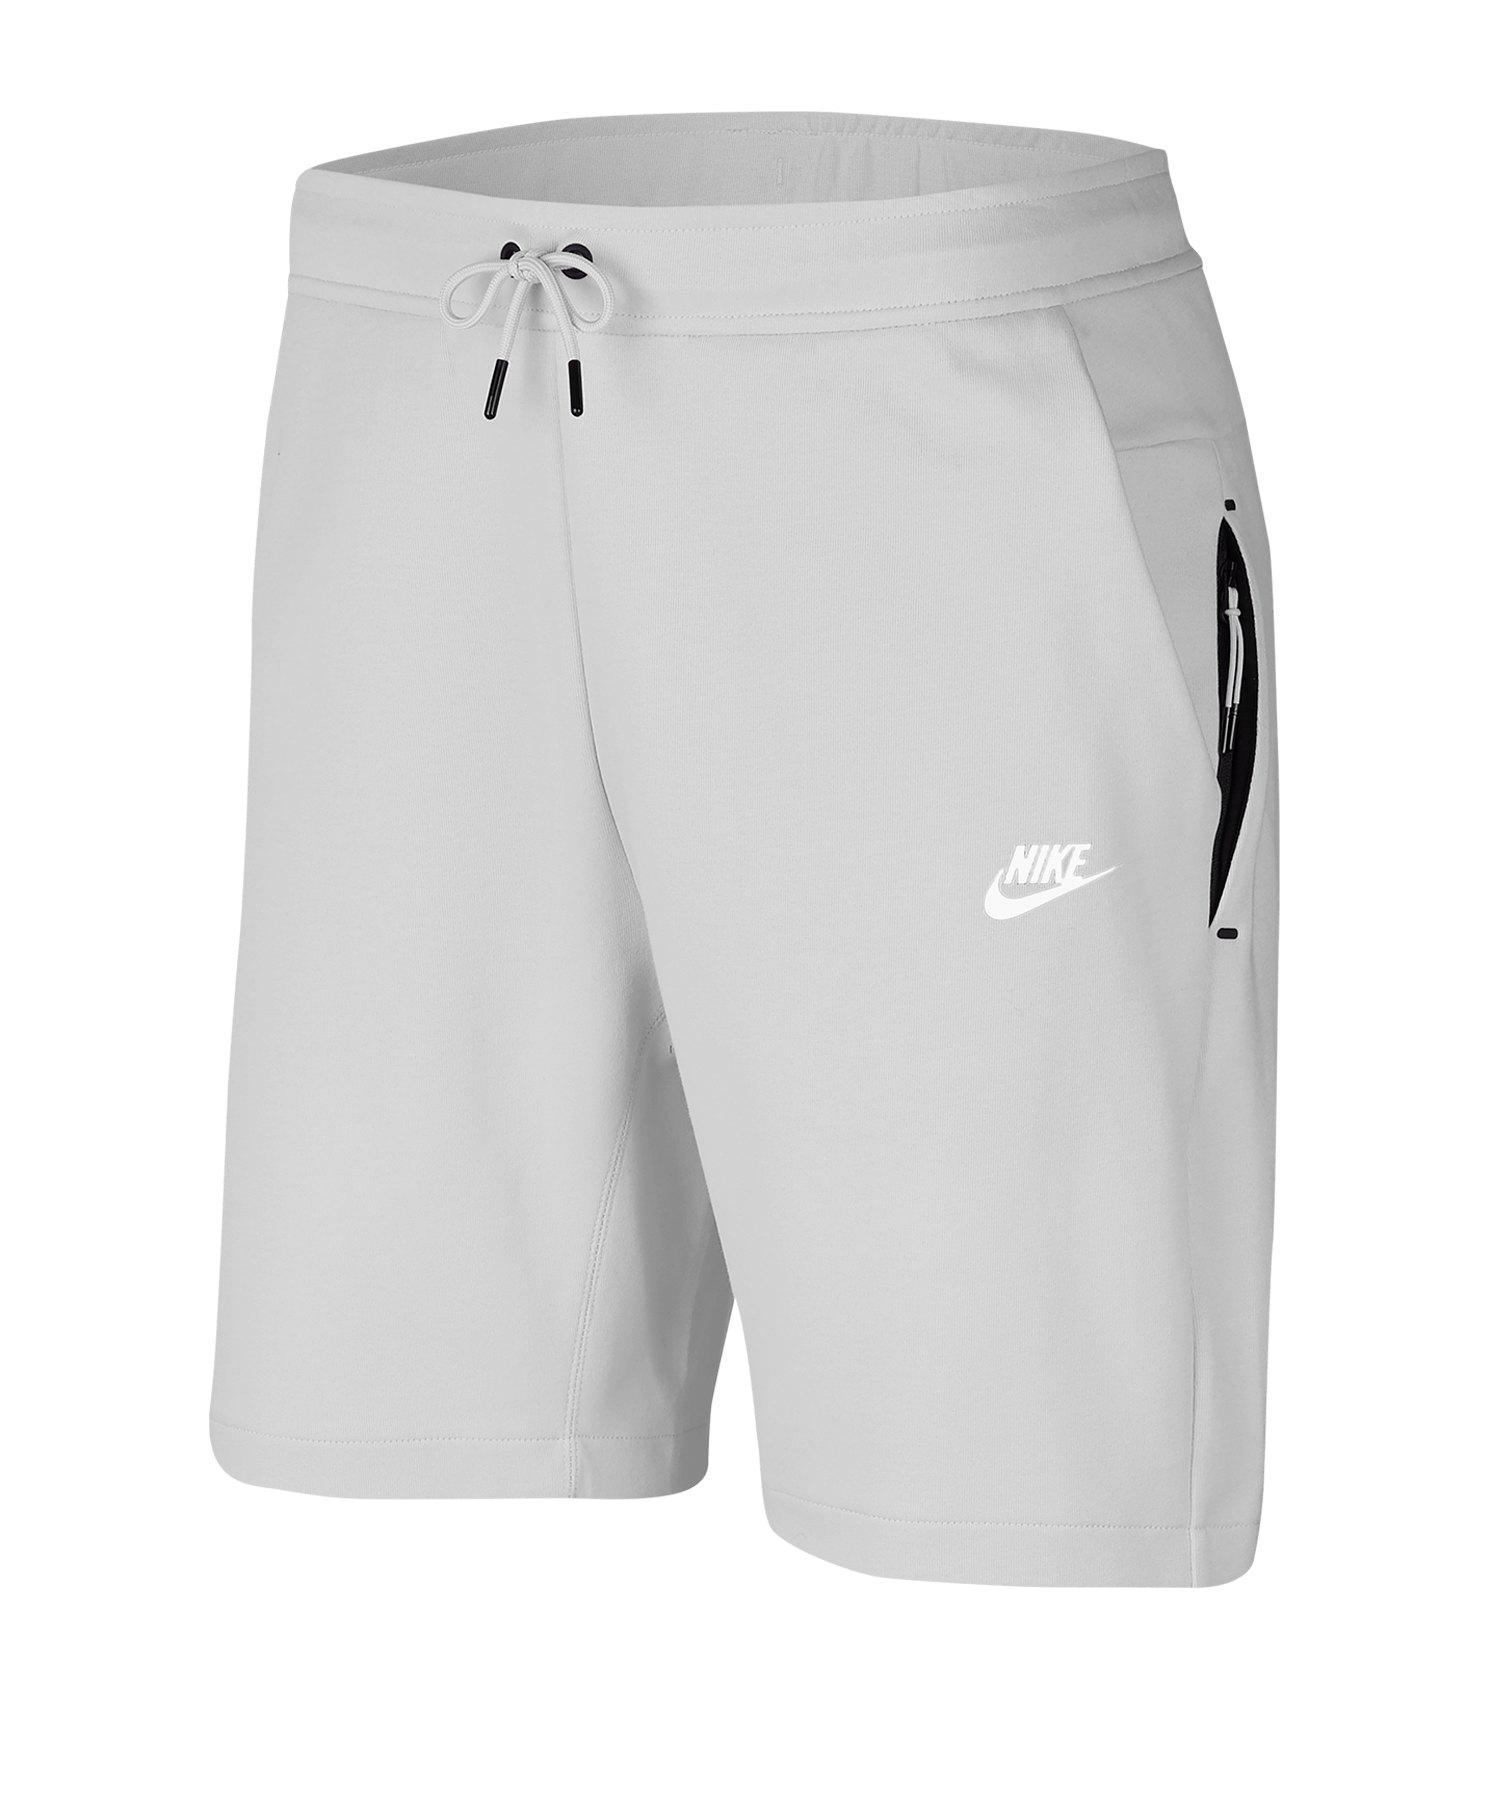 Nike Tech Fleece Short Grau F043 - grau